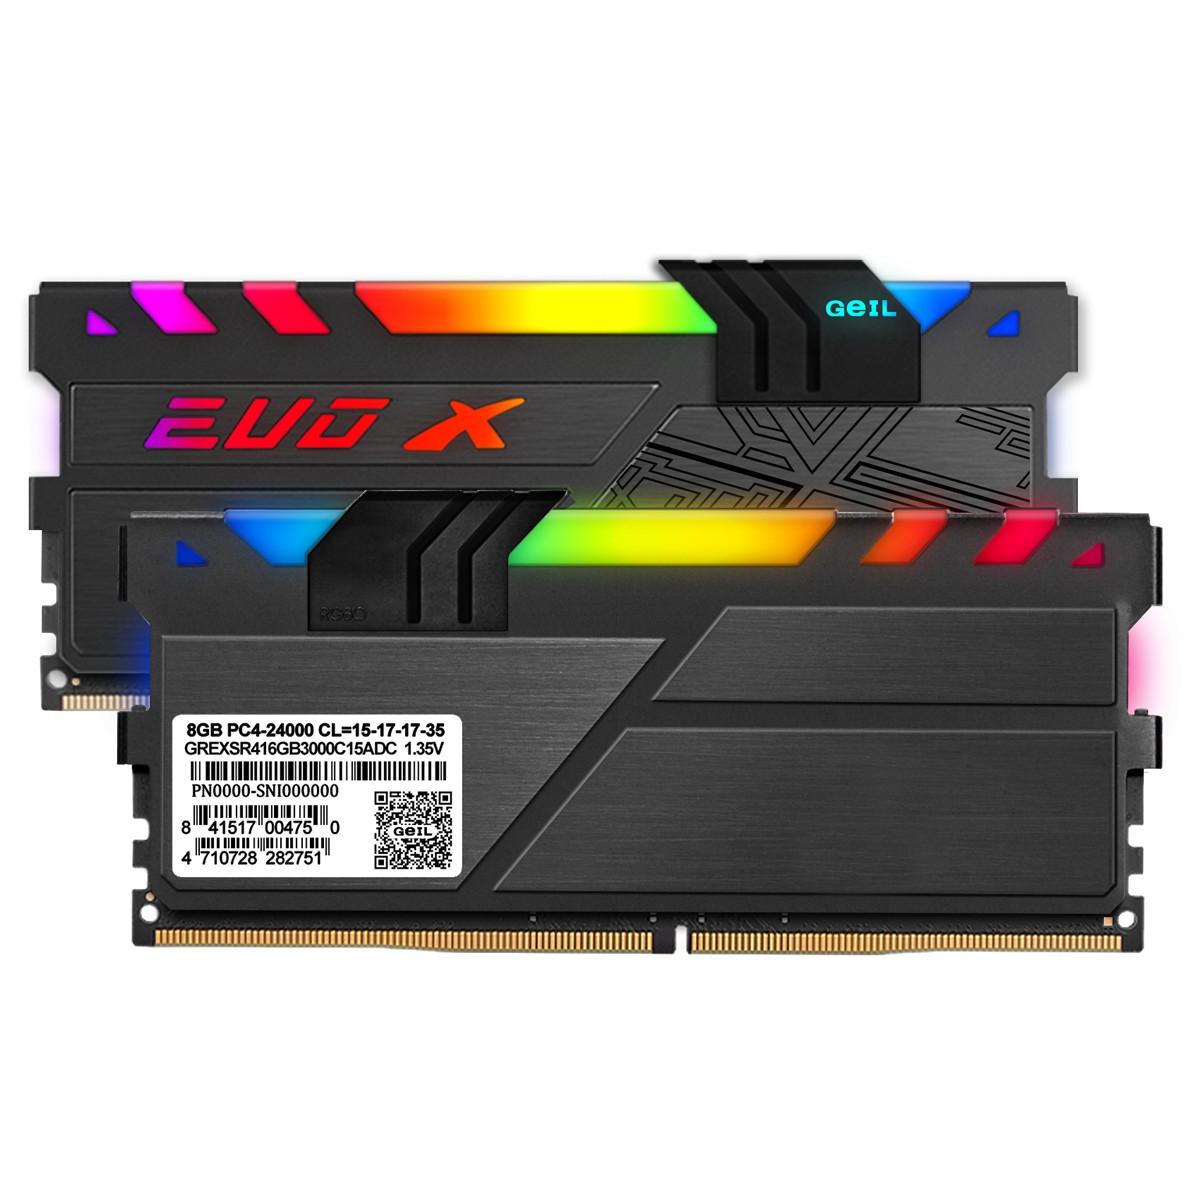 Memória DDR4 Geil EVO X II RGB, 16GB (2x8GB) 3000MHz, ROG CERTIFIED, BLACK, GREXSR416GB3000C15ADC